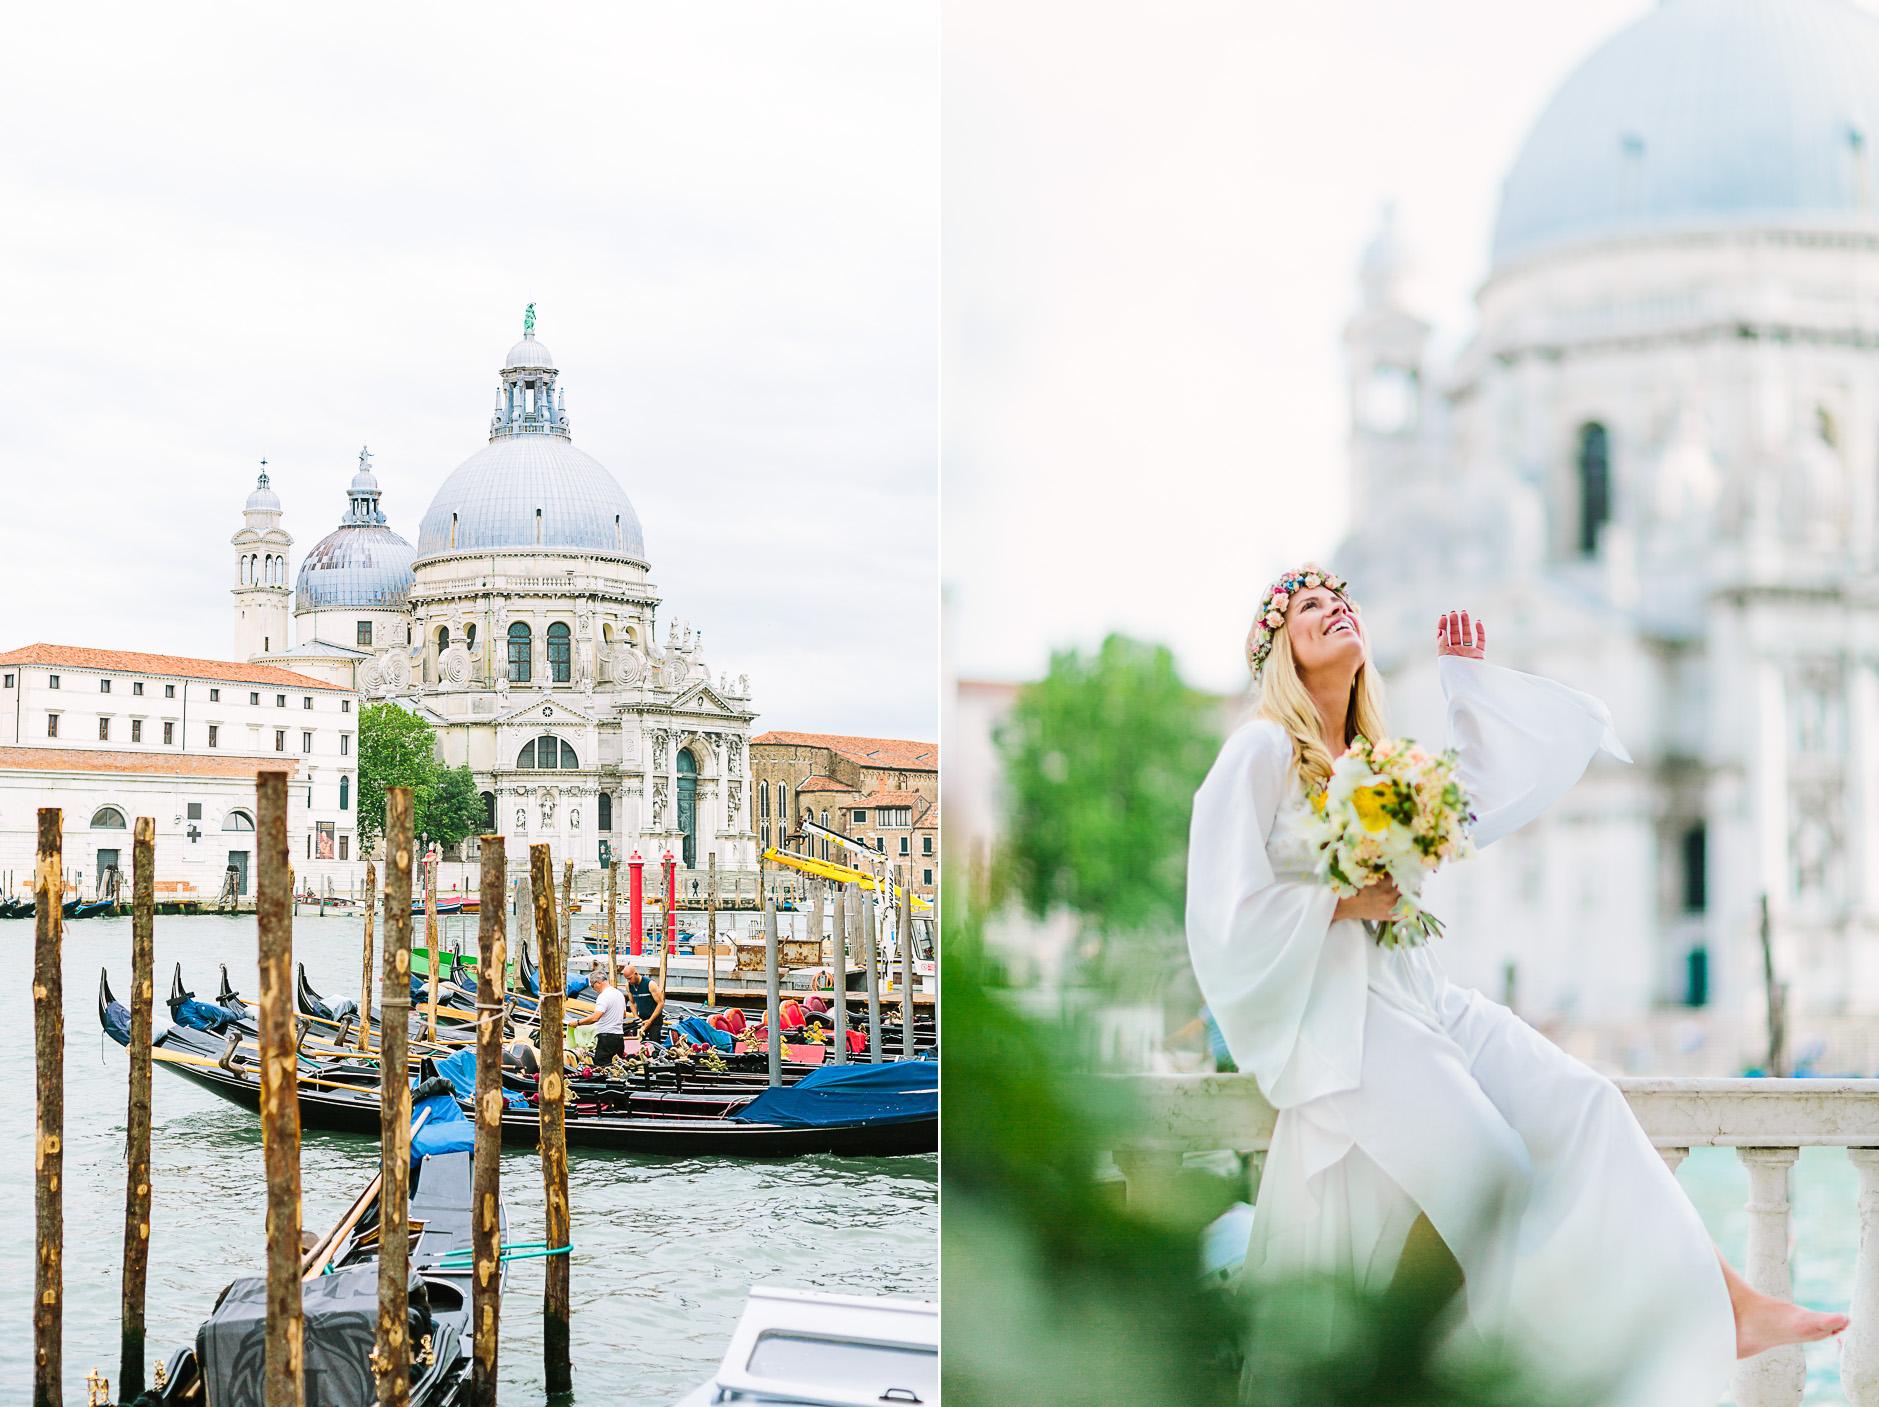 Hochzeitsfotograf Le Hai Linh Boho Chic After Wedding Shooting Venedig Timo Horn 1.FC Koeln 042.jpg